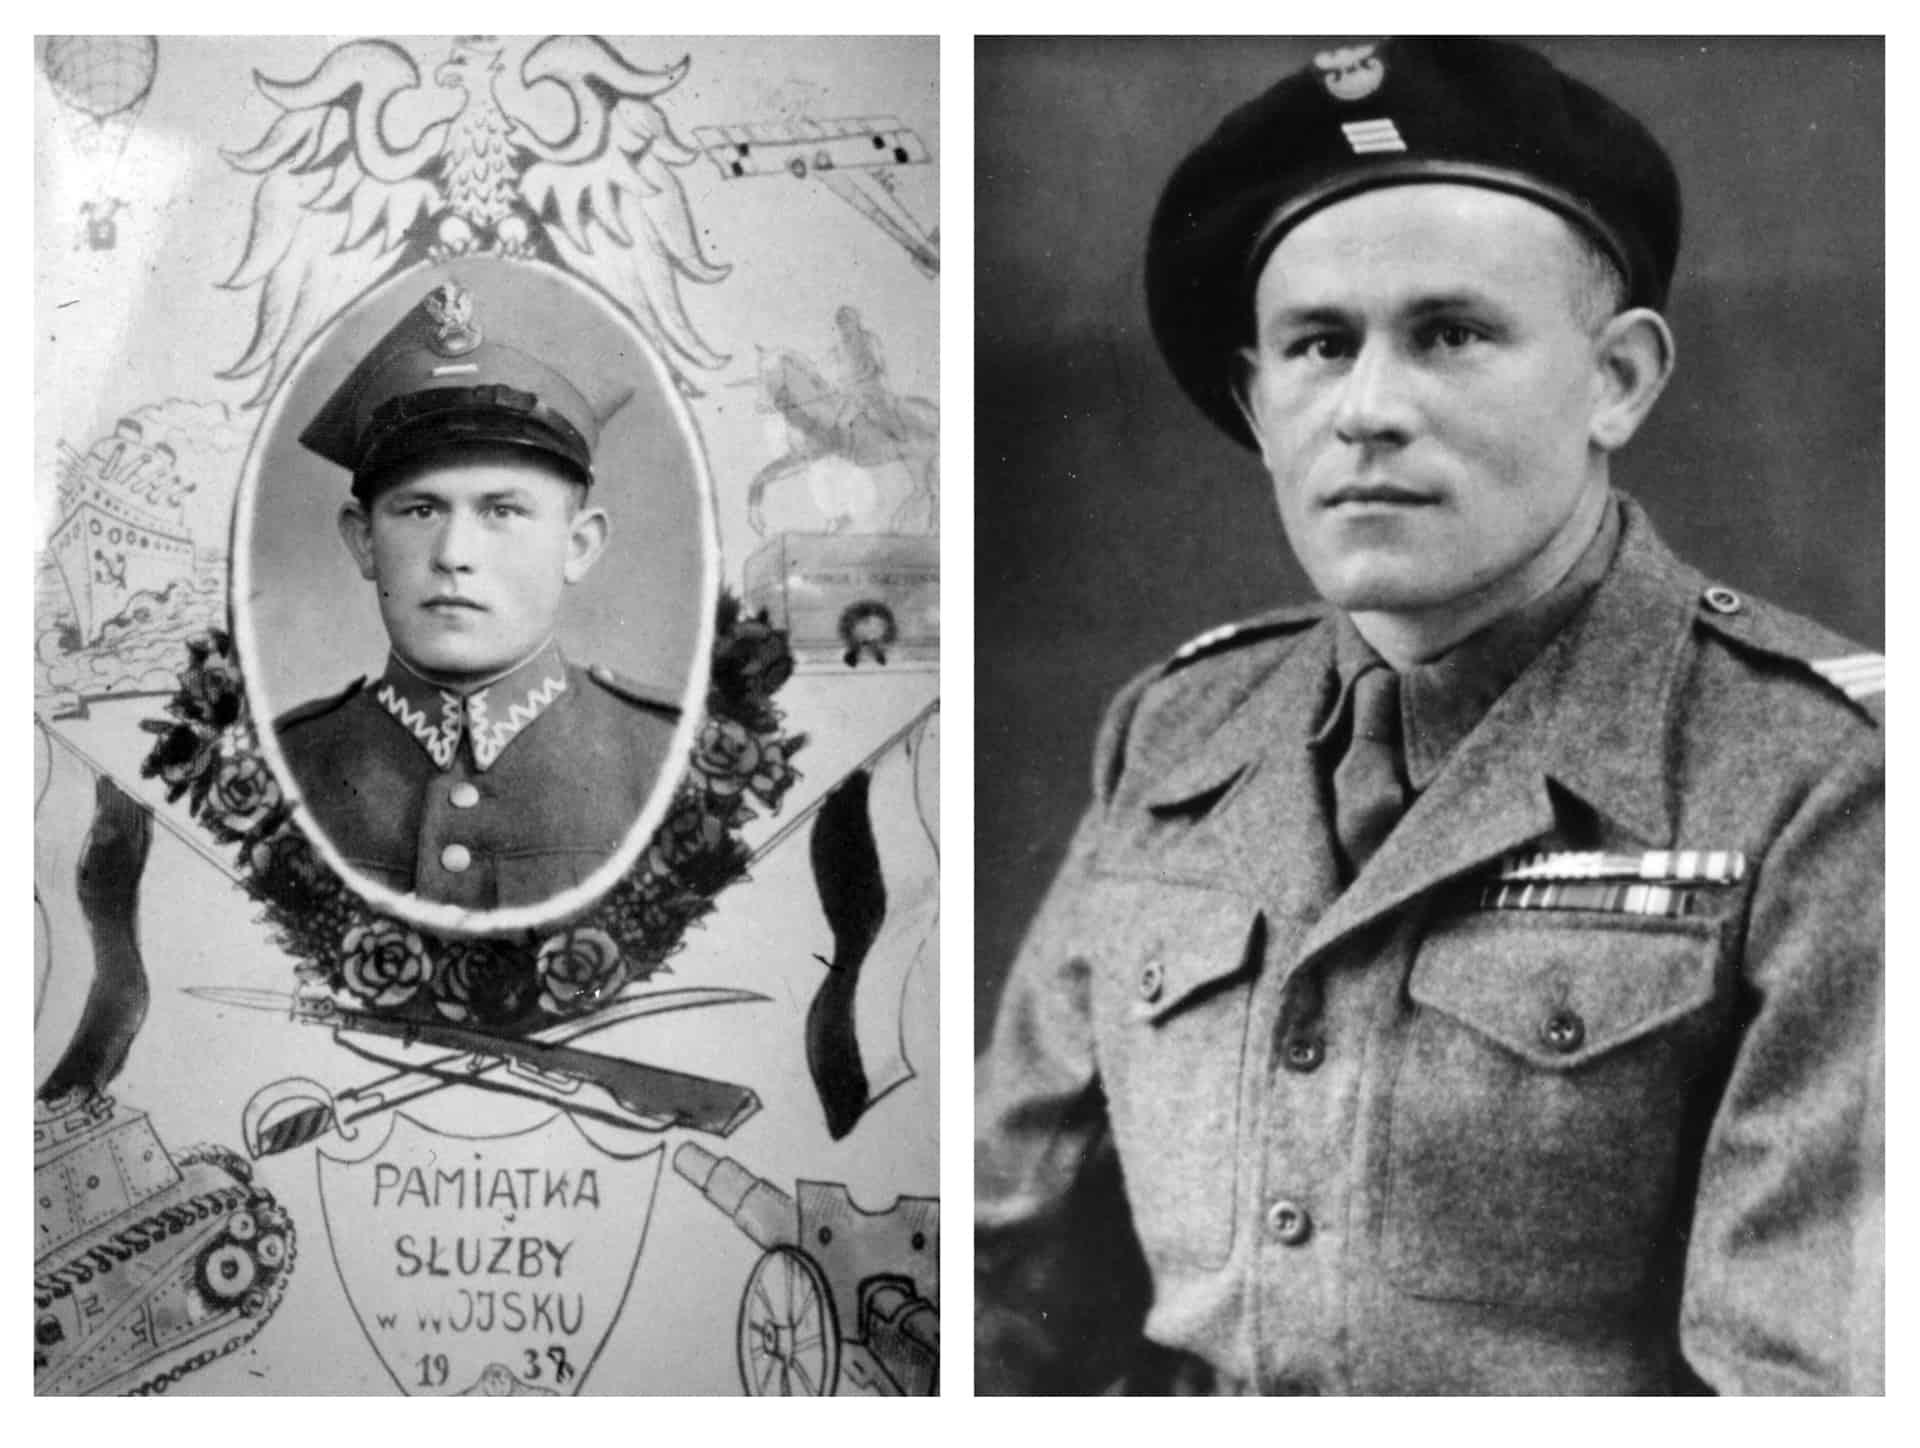 Left: Emil, Polish Army, 1939.  Right: Emil, Polish Second Corps, 1946